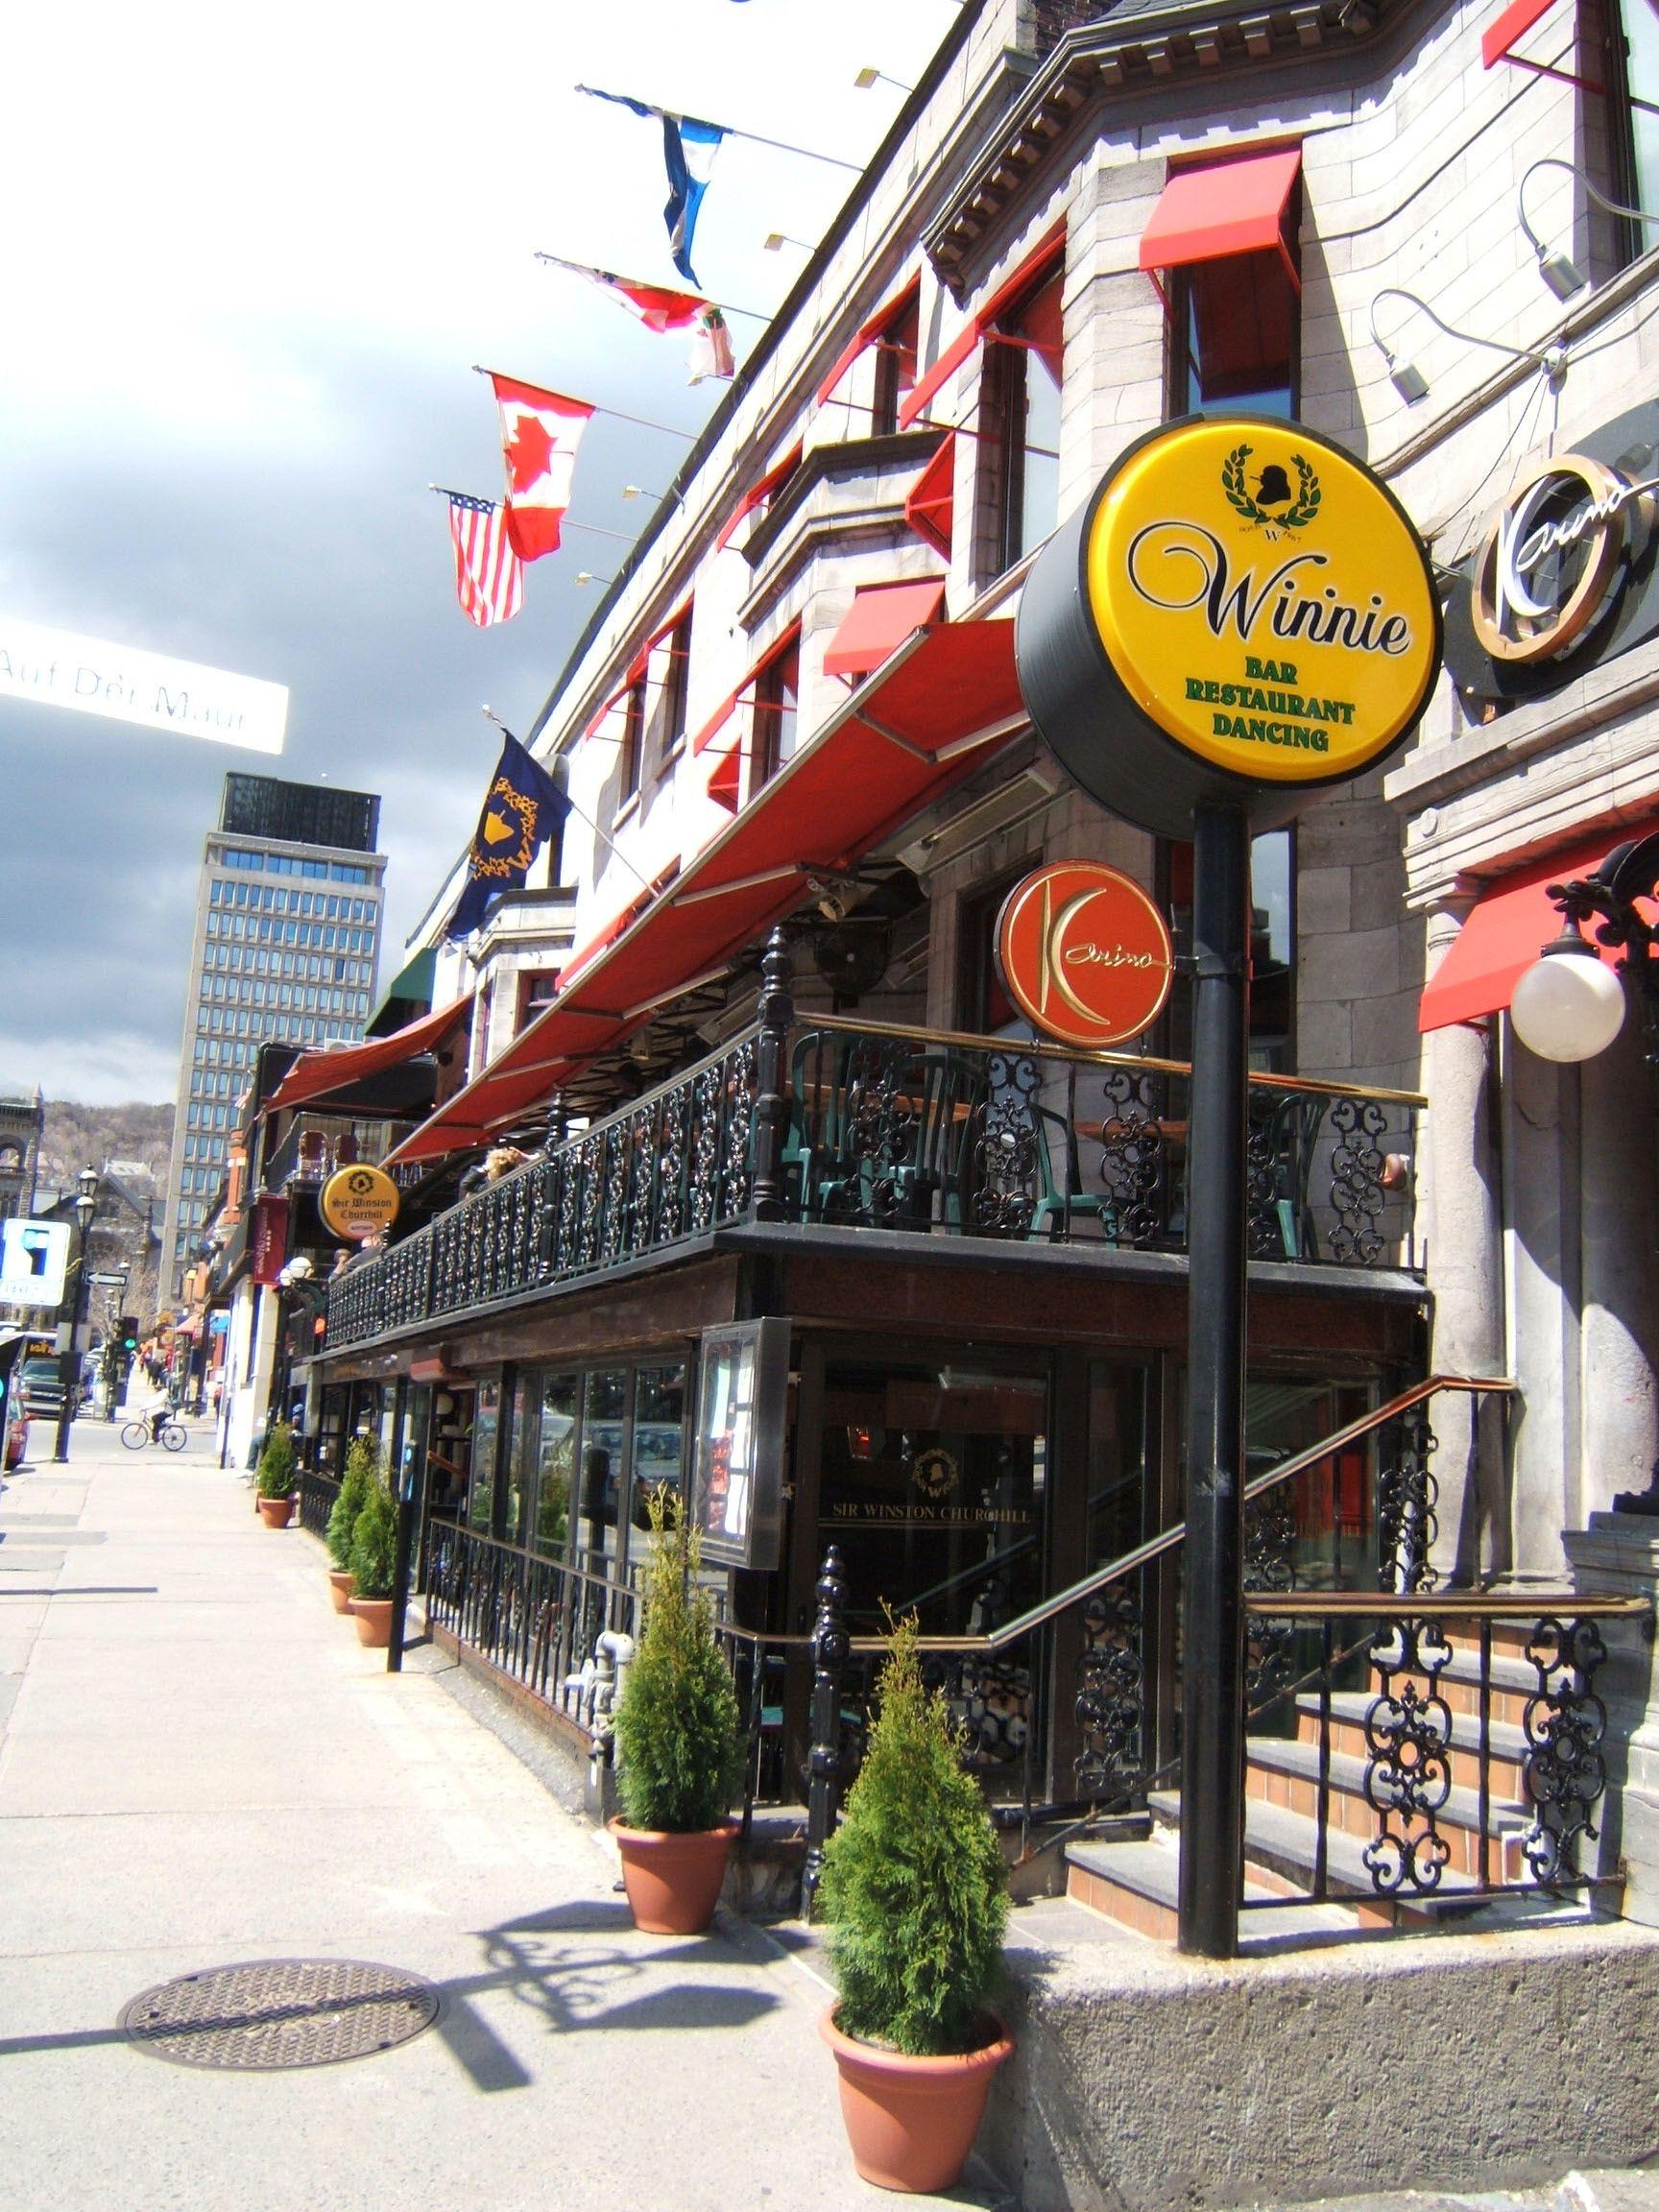 Sir Winston Churchill Pub Montreal Quebec Montreal Canada